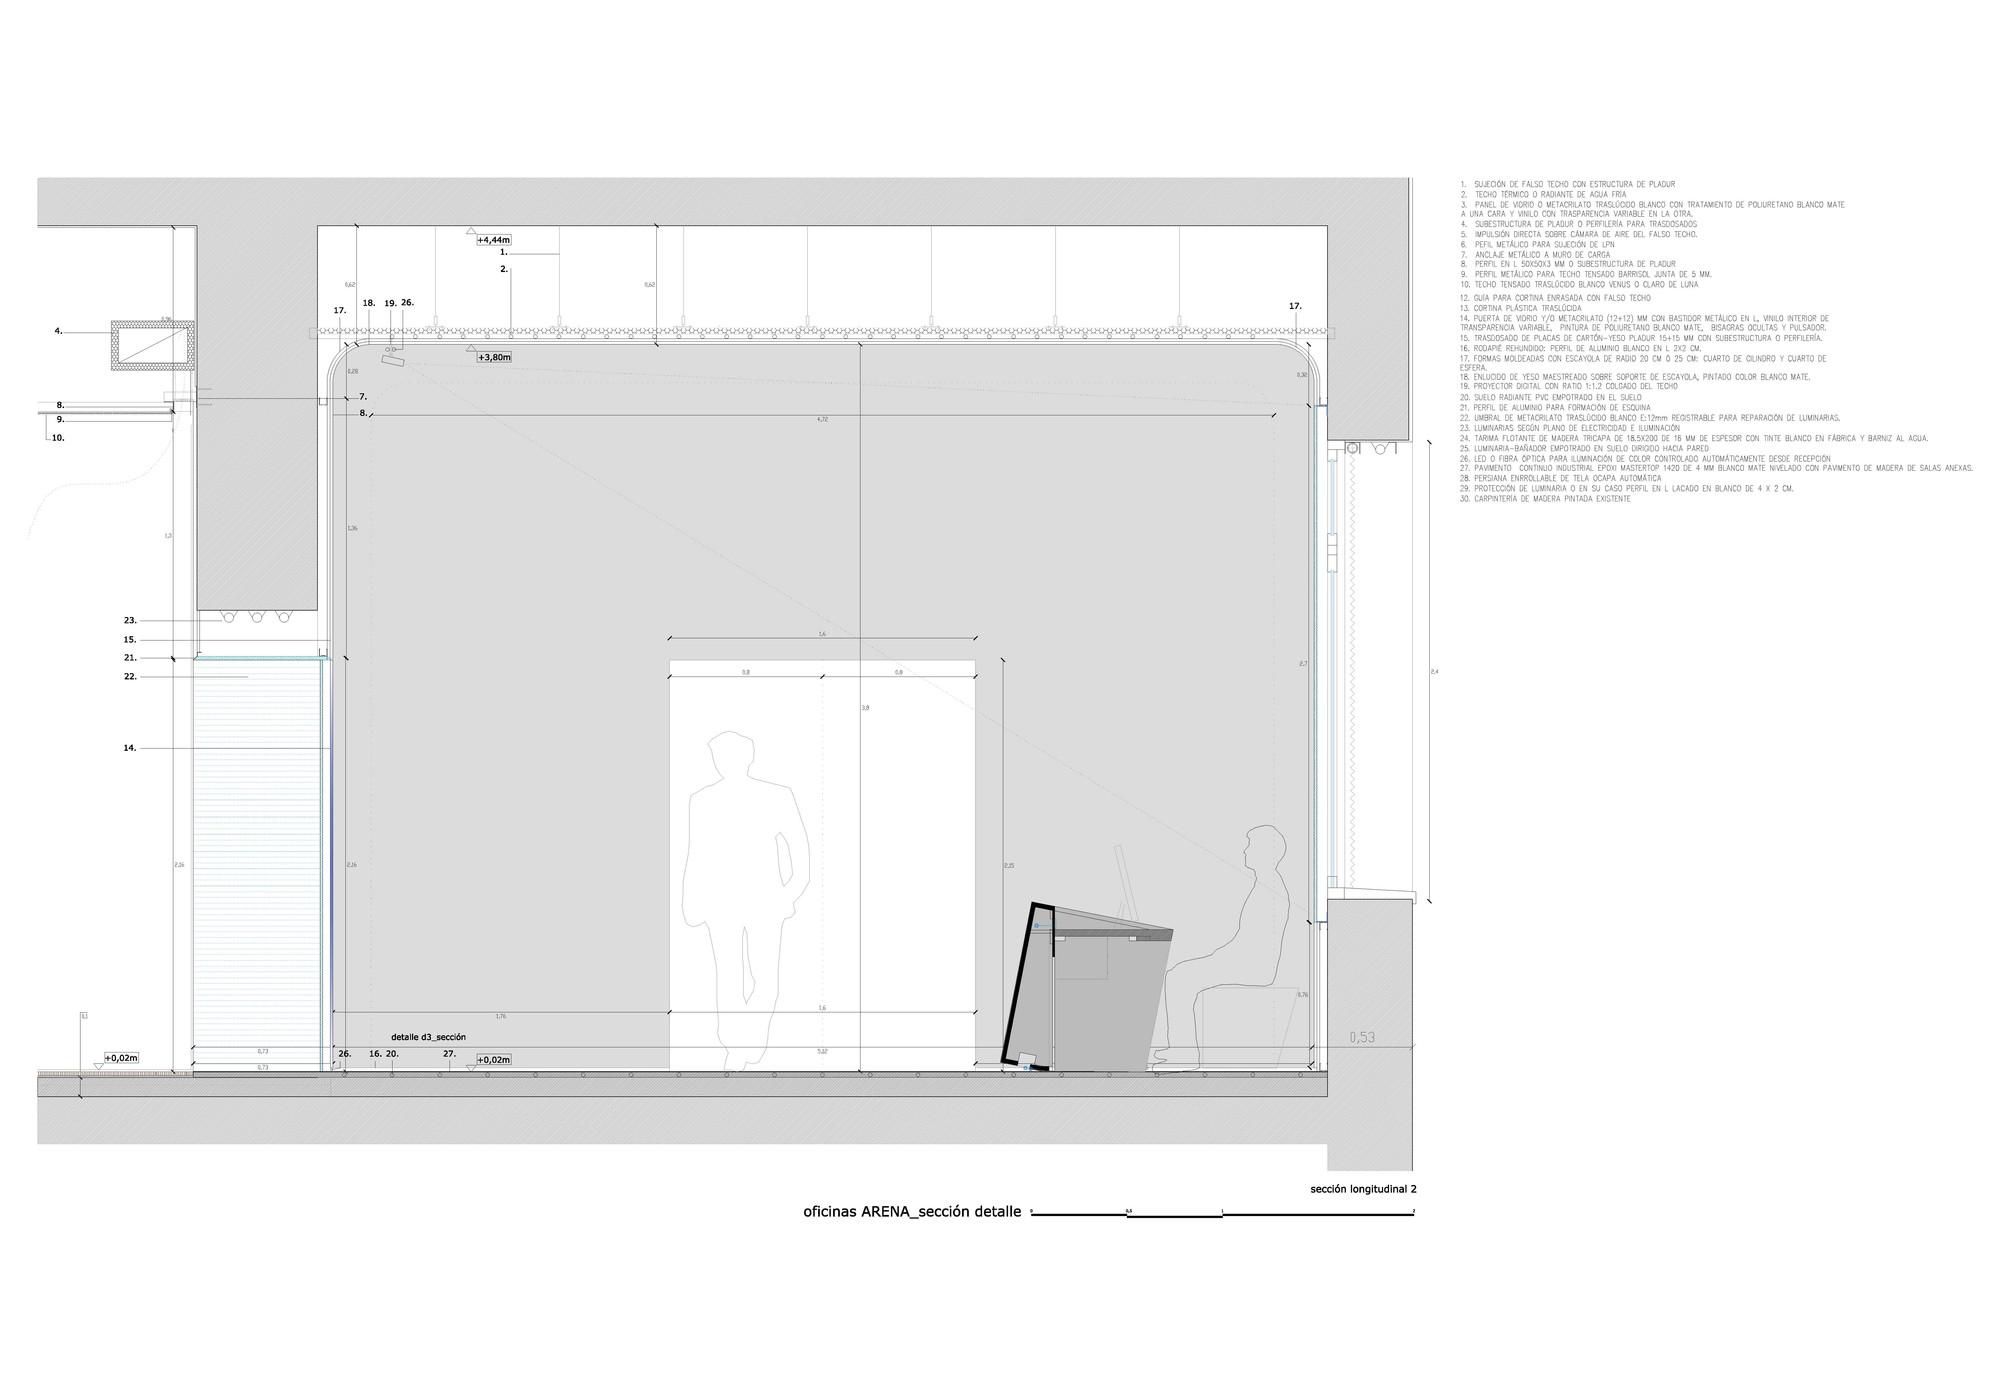 Galer a de oficinas arena cuac arquitectura 36 - Cuac arquitectura ...